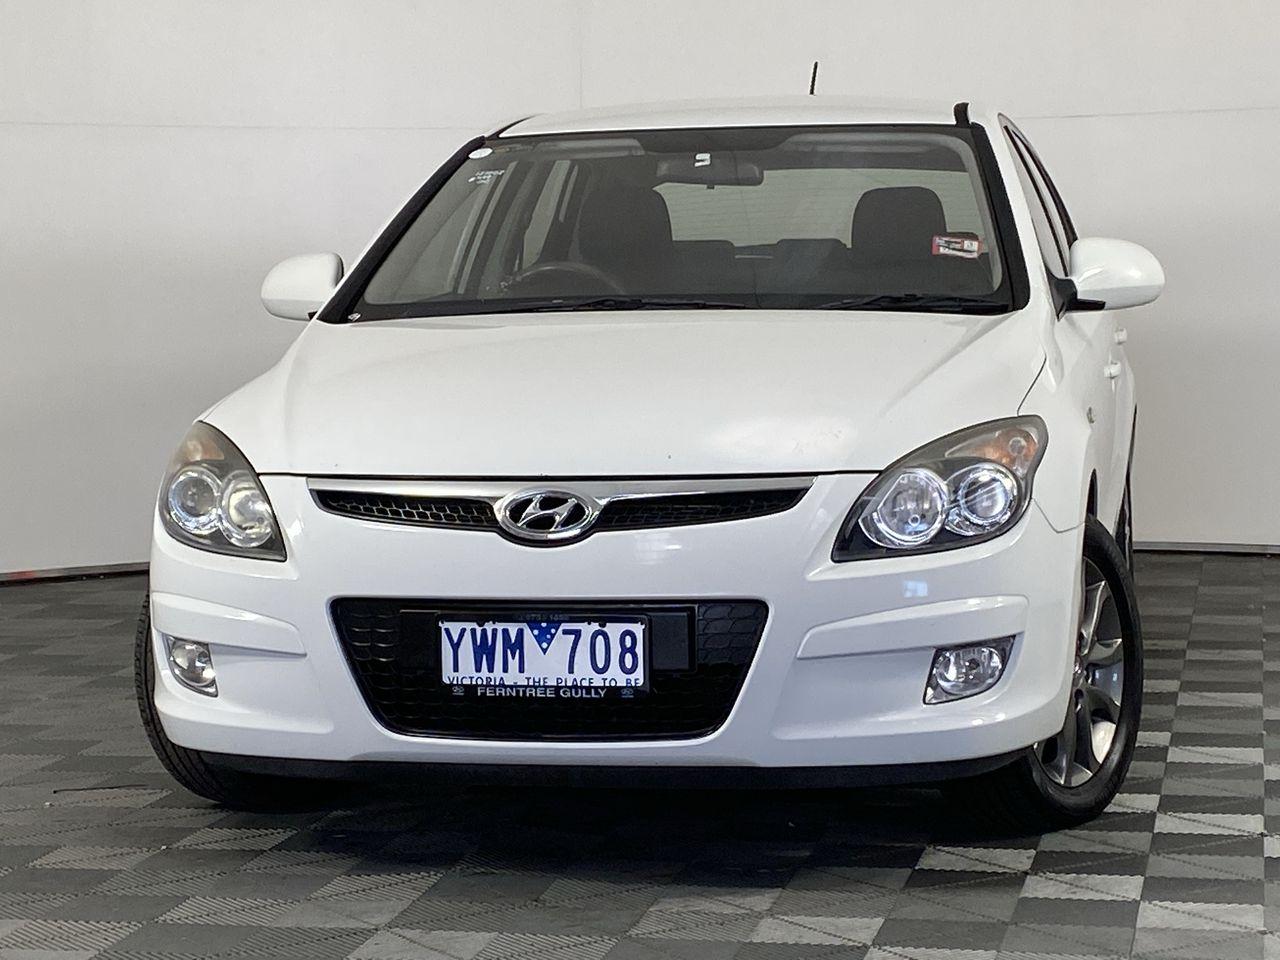 2012 Hyundai i30 SLX FD Automatic Hatchback